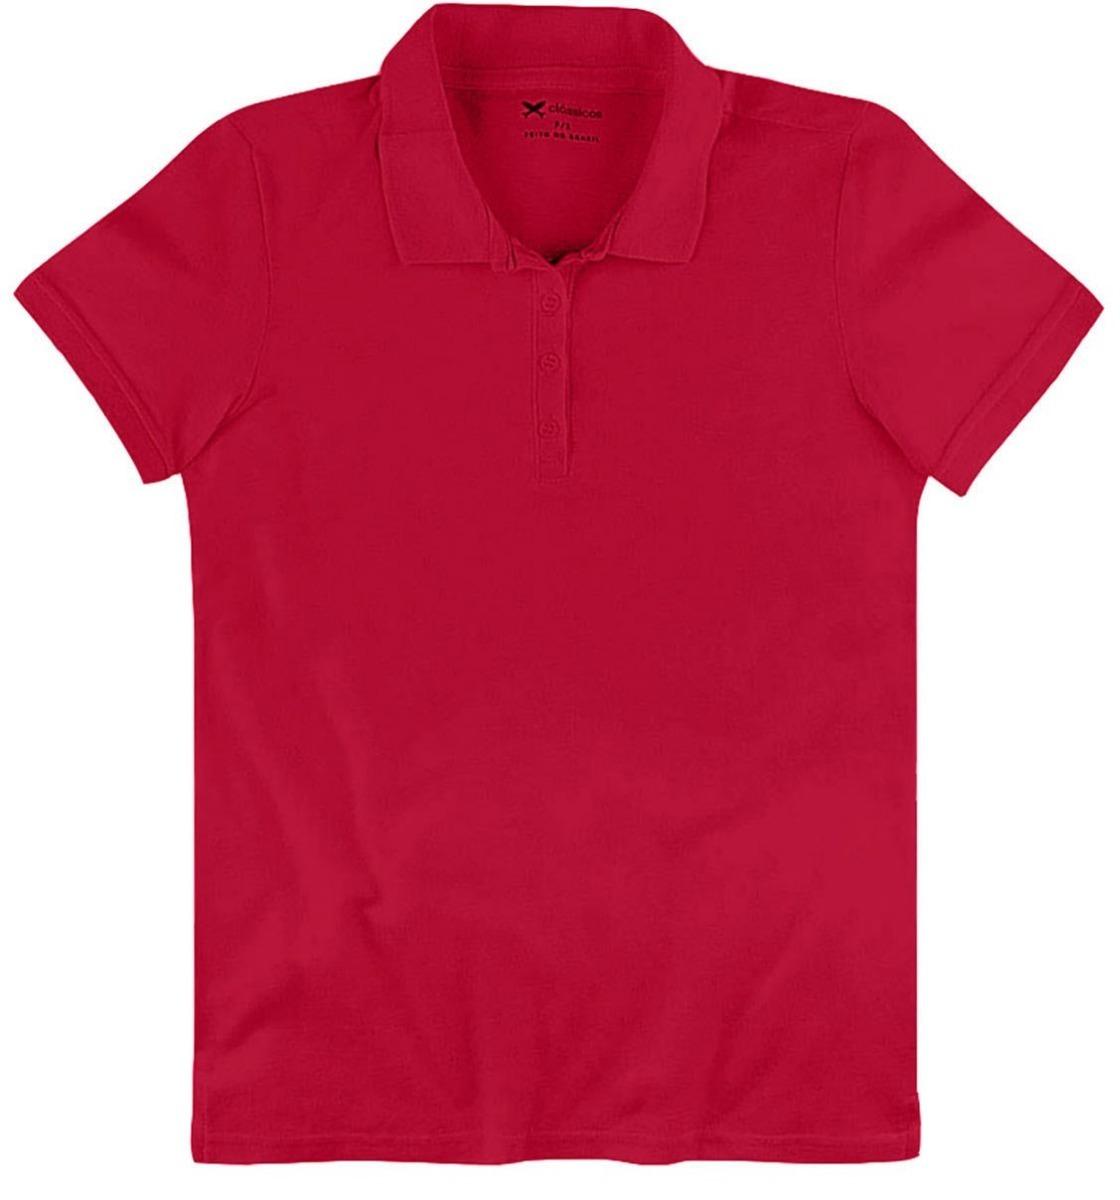 camisa pólo feminina hering básica malha piquê ( n36x )rpy. Carregando zoom. 7efb7af5cf9be